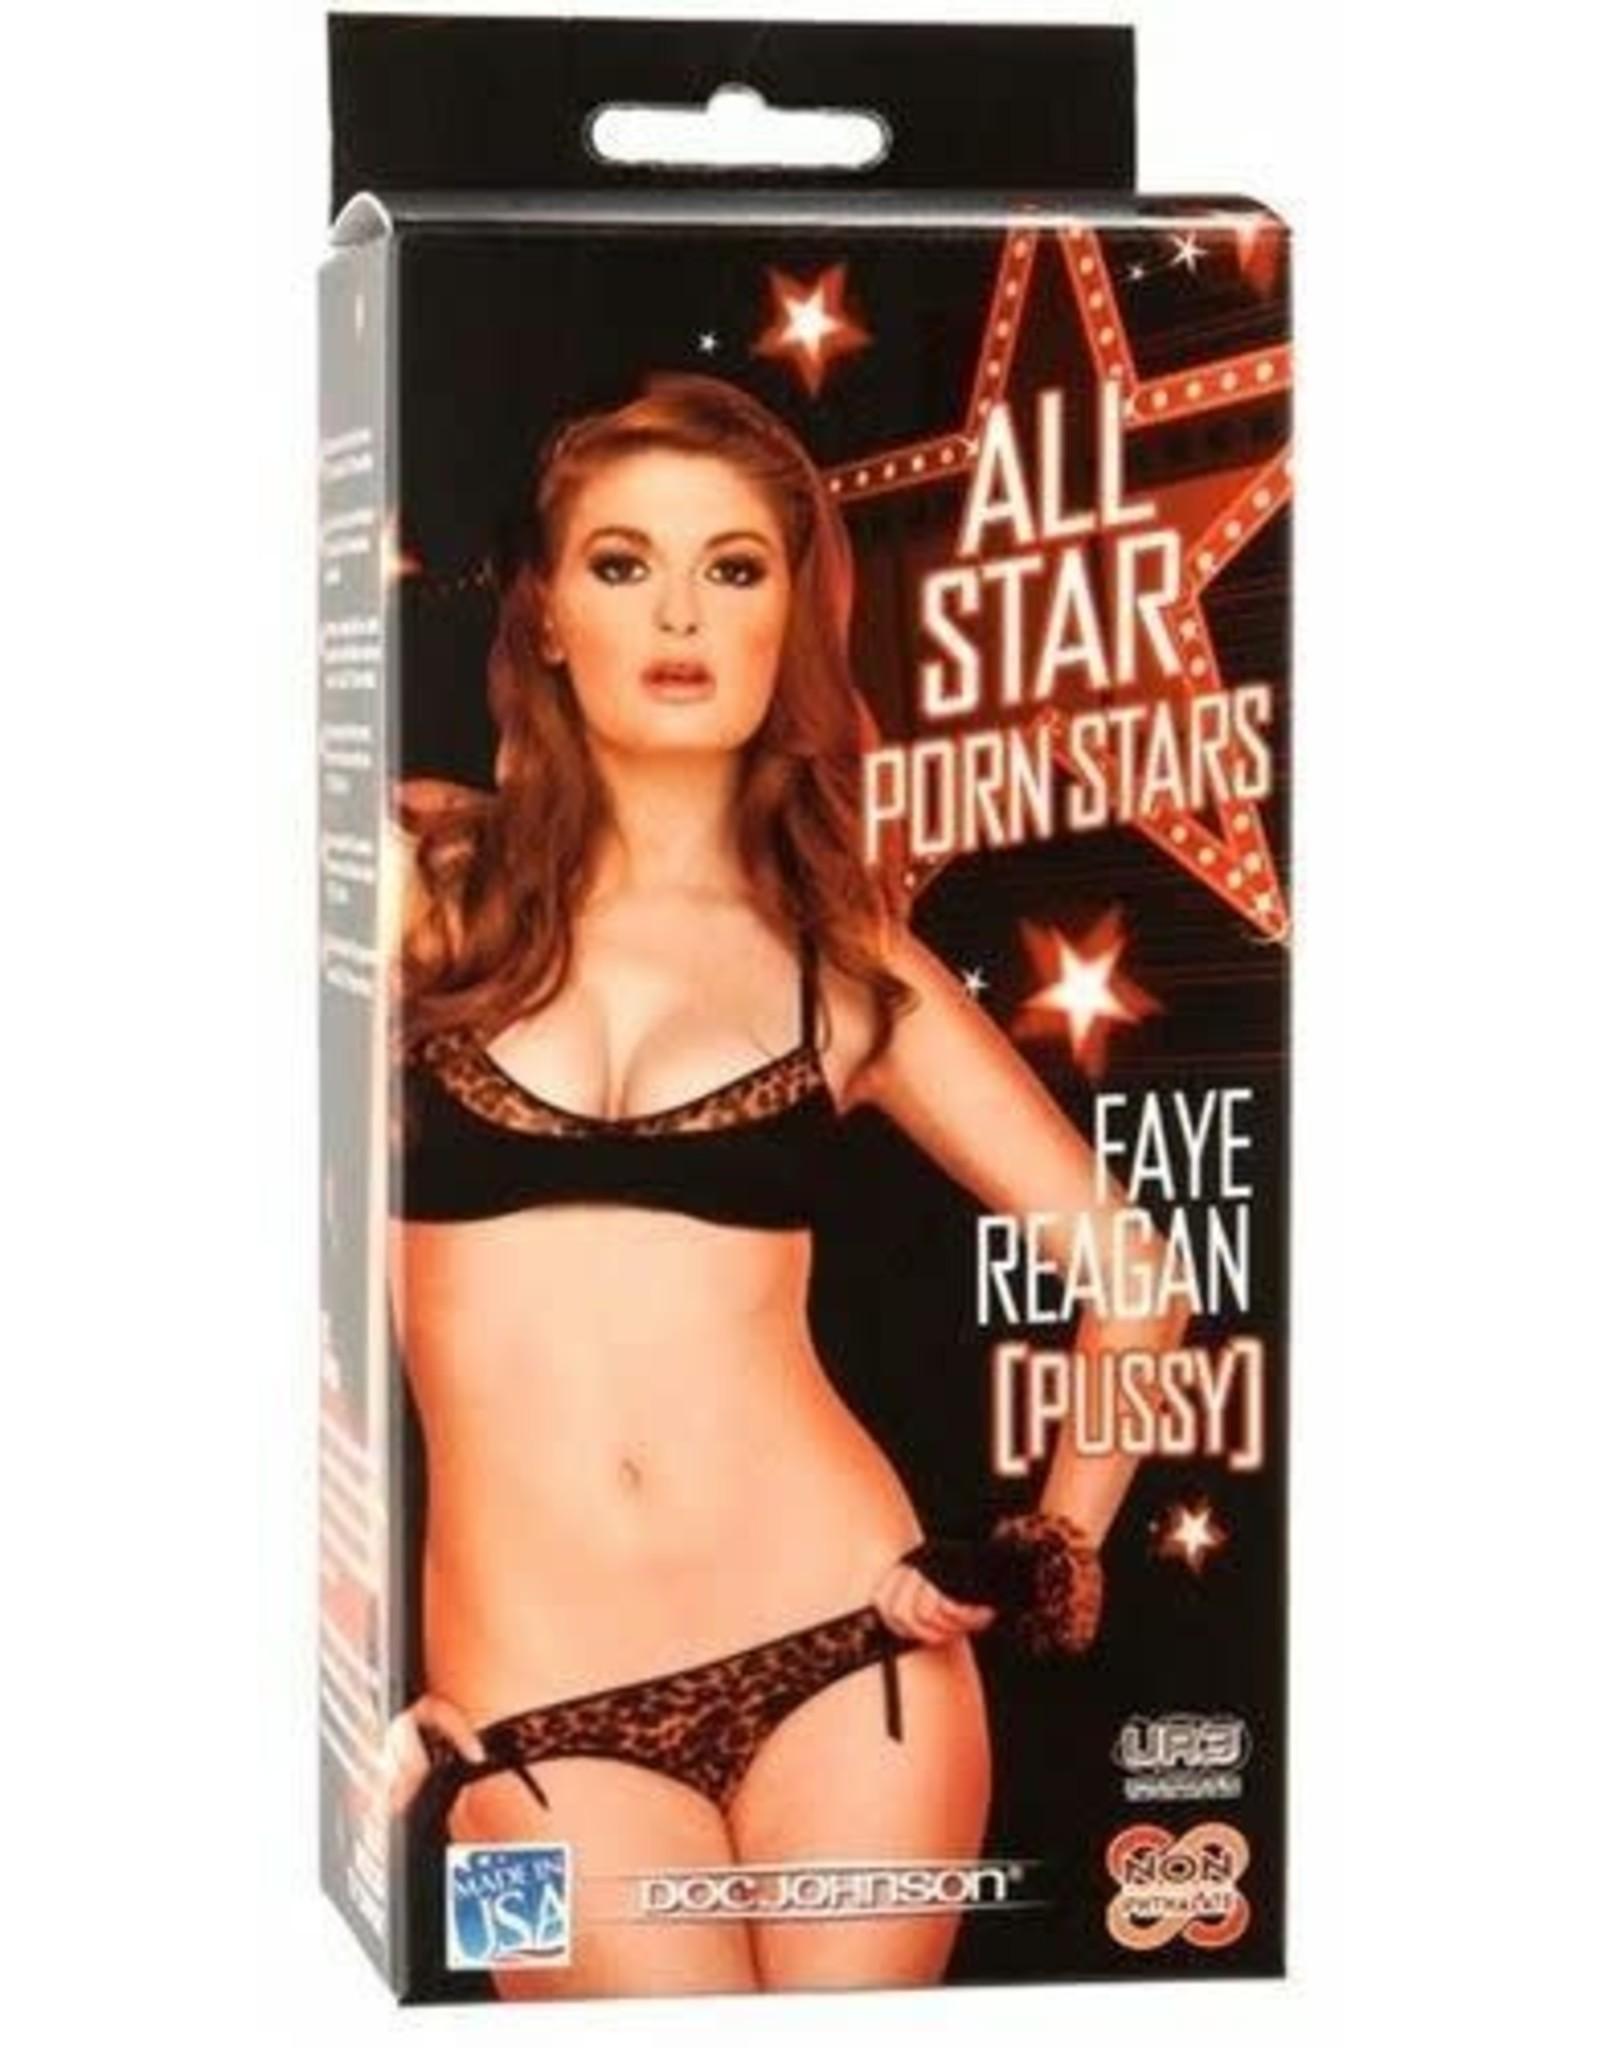 ALL STARS - FAYE REAGAN - PUSSY